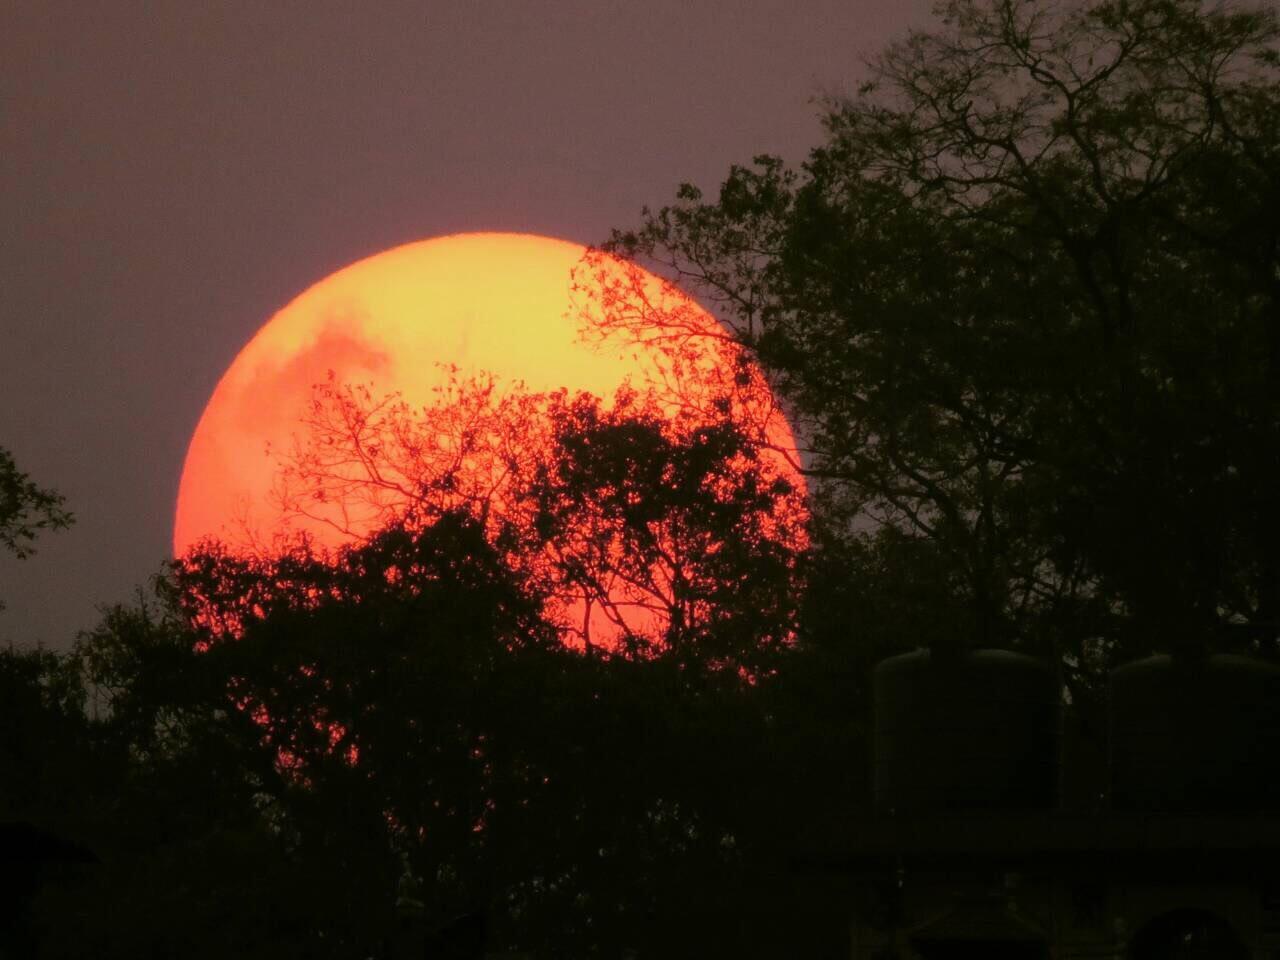 Sunset Nepal by Subash Tiwari